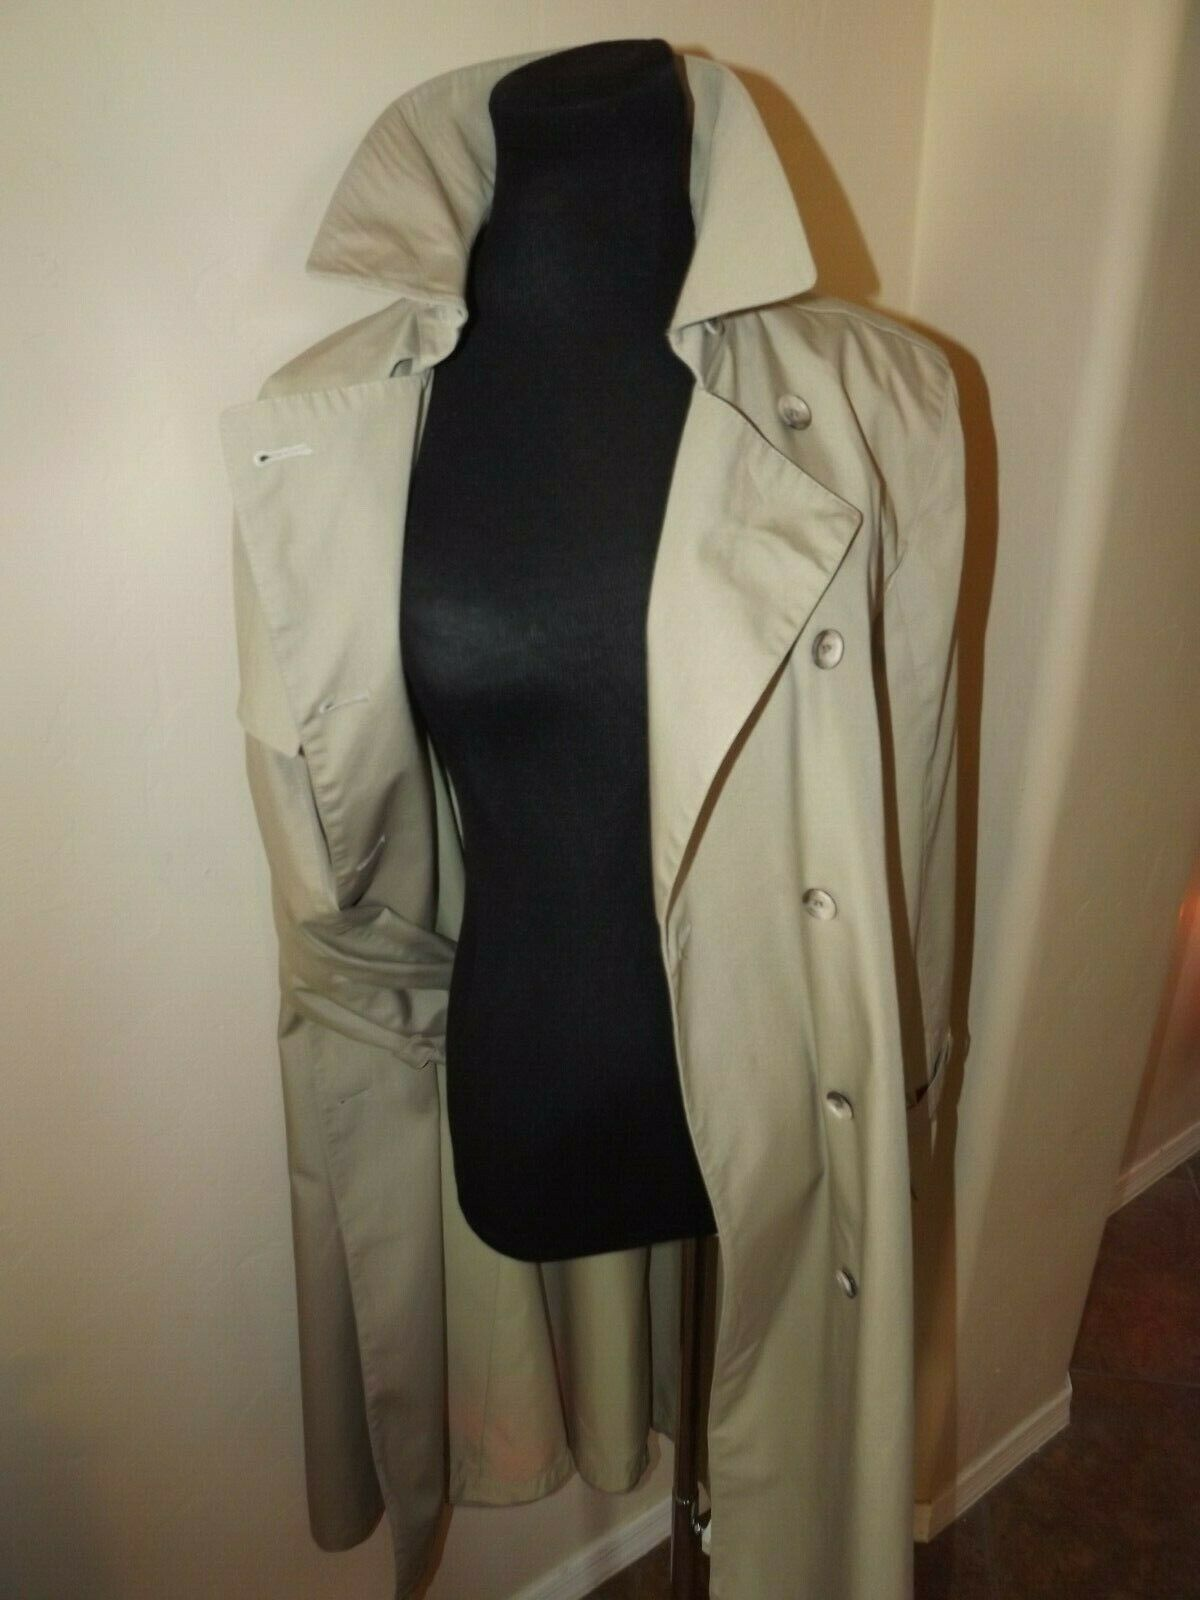 WOW  London Fog Khaki Beige Traditional Trench Coat Size 8 REG - No belt